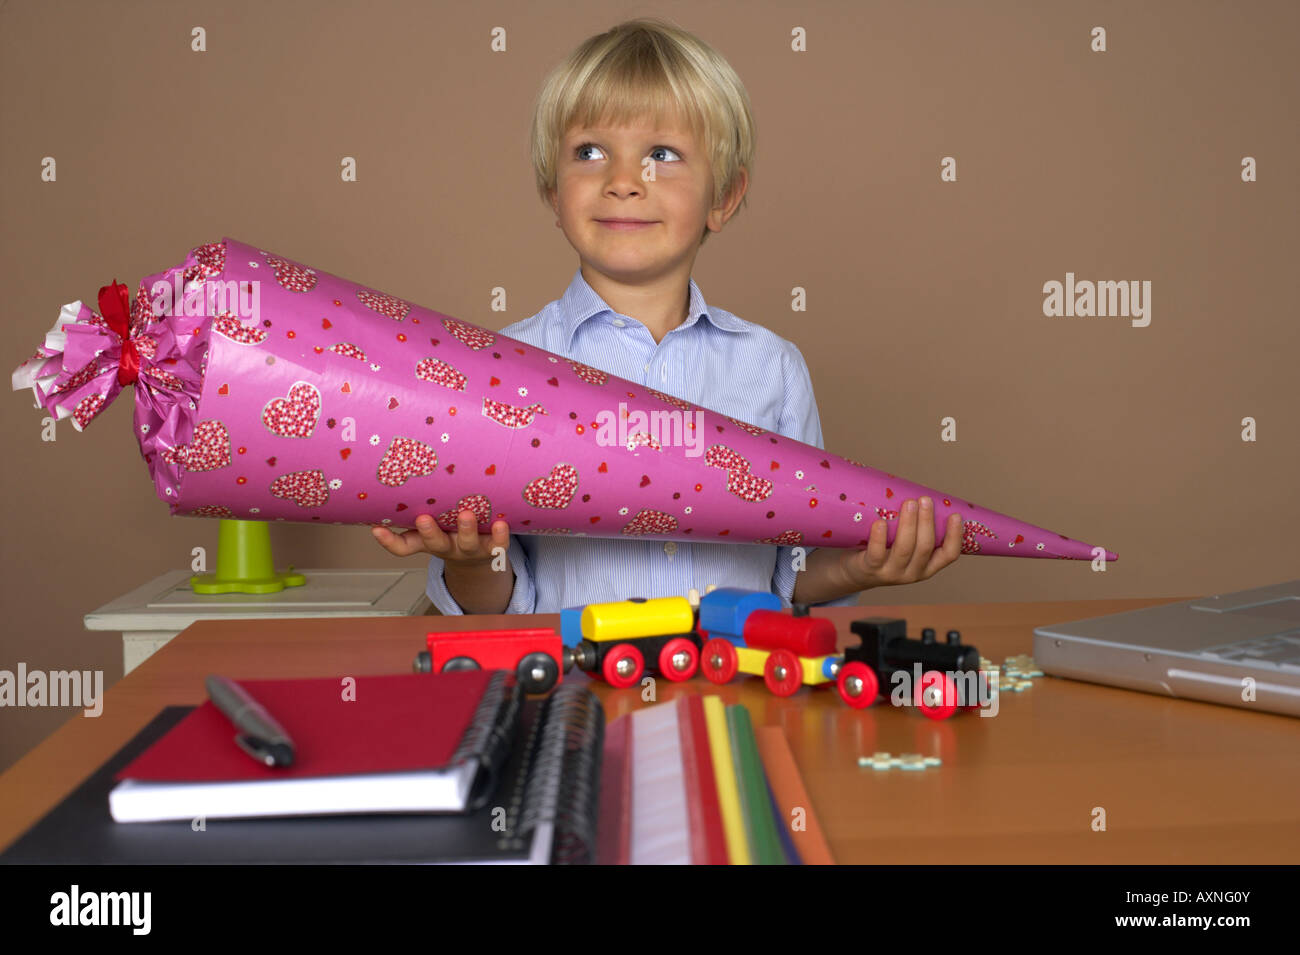 Junge (4-5 Jahre) hält einen dekorative Kegel Stockbild